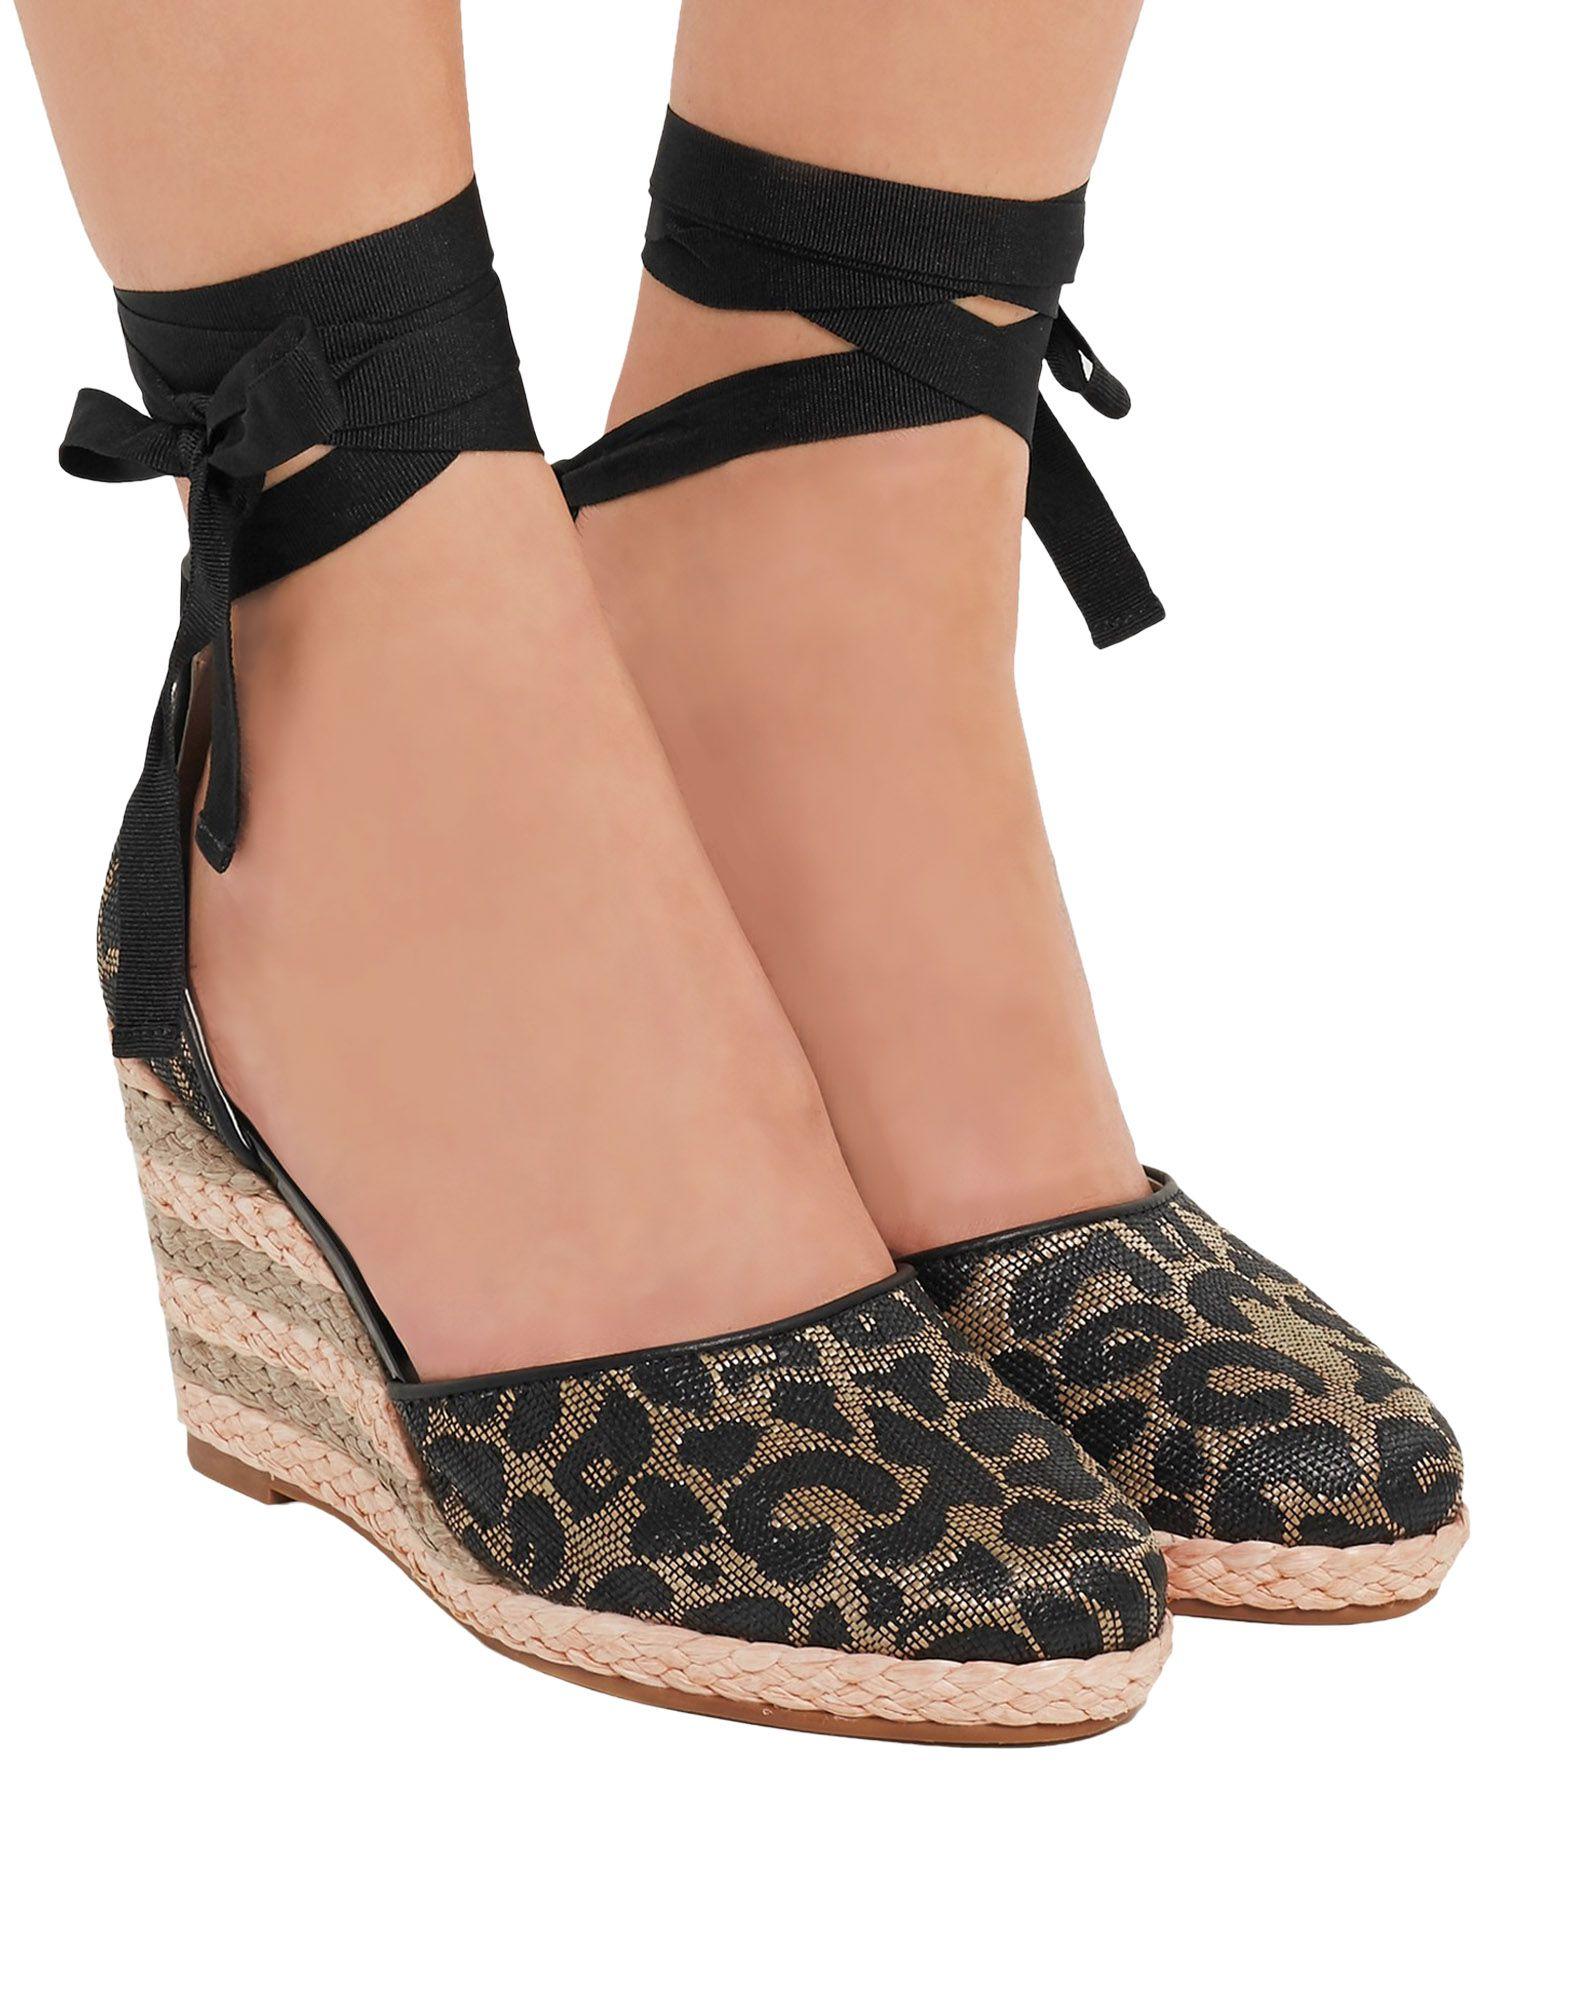 Sophia 11524378MMGut Webster Espadrilles Damen  11524378MMGut Sophia aussehende strapazierfähige Schuhe 3fa92a